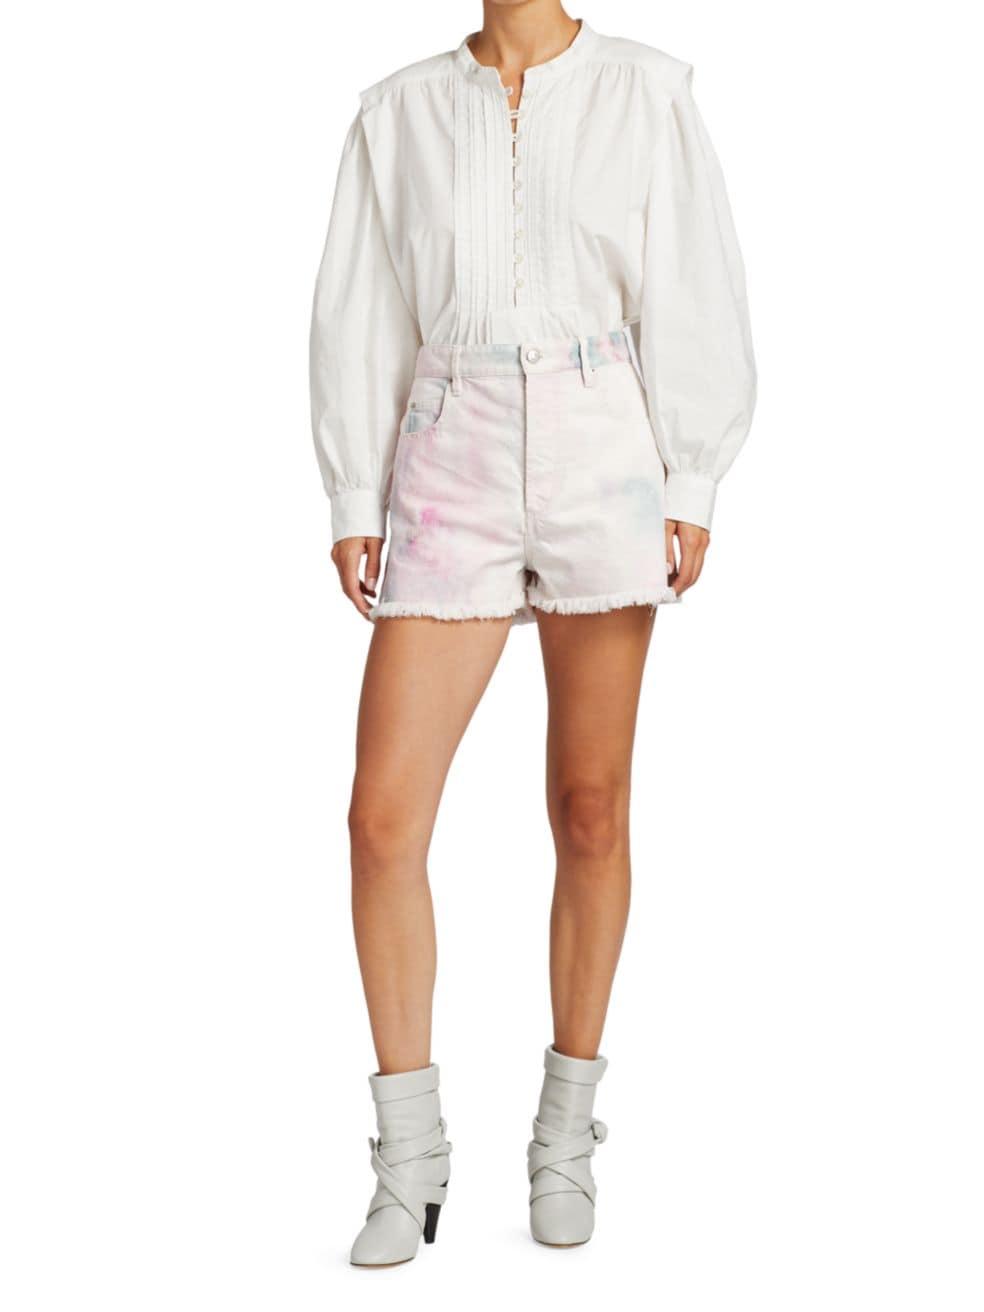 Isabel Marant Etoile Lesiab Tie-Dye Denim Shorts | SaksFifthAvenue